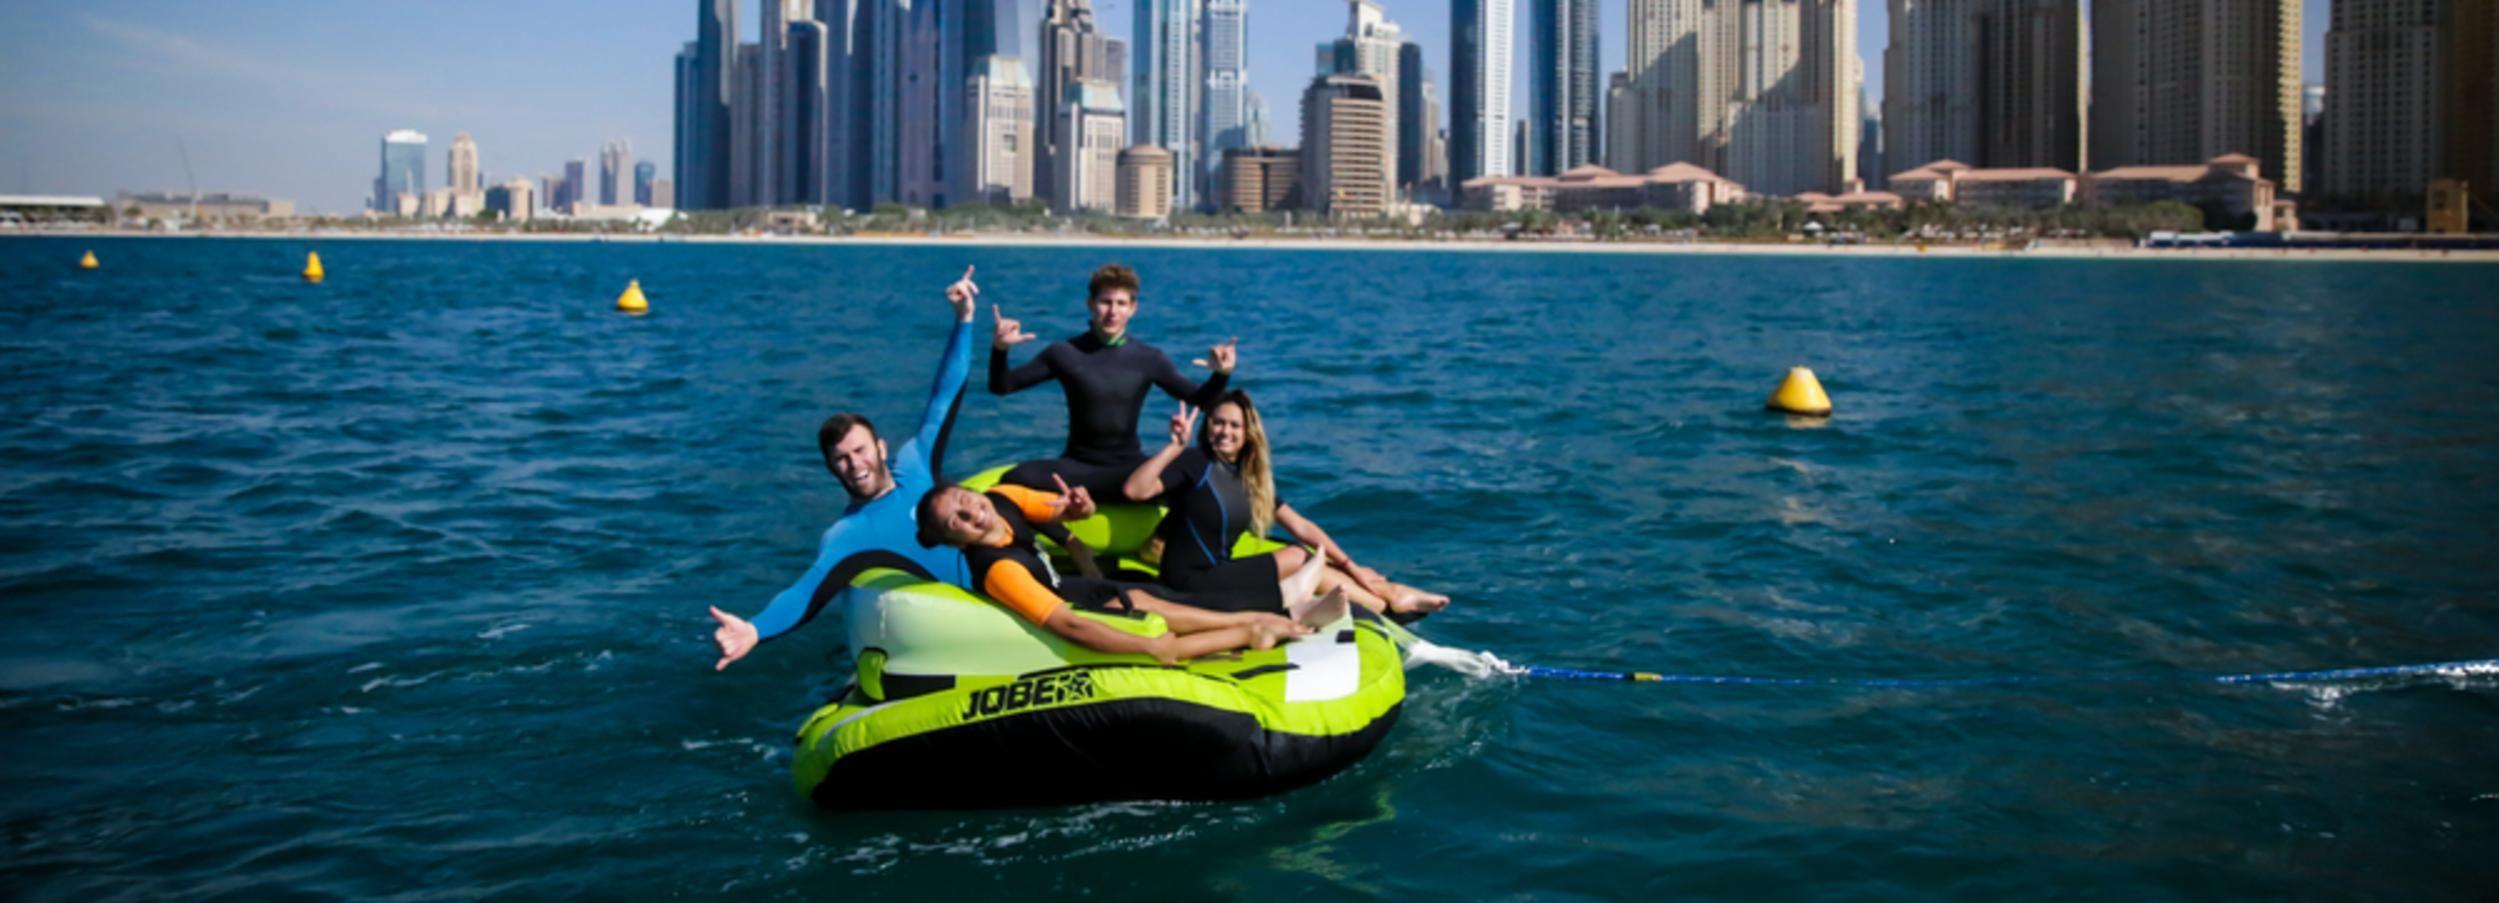 Dubai: donutvaart bij de Jumeirah Beach Residence